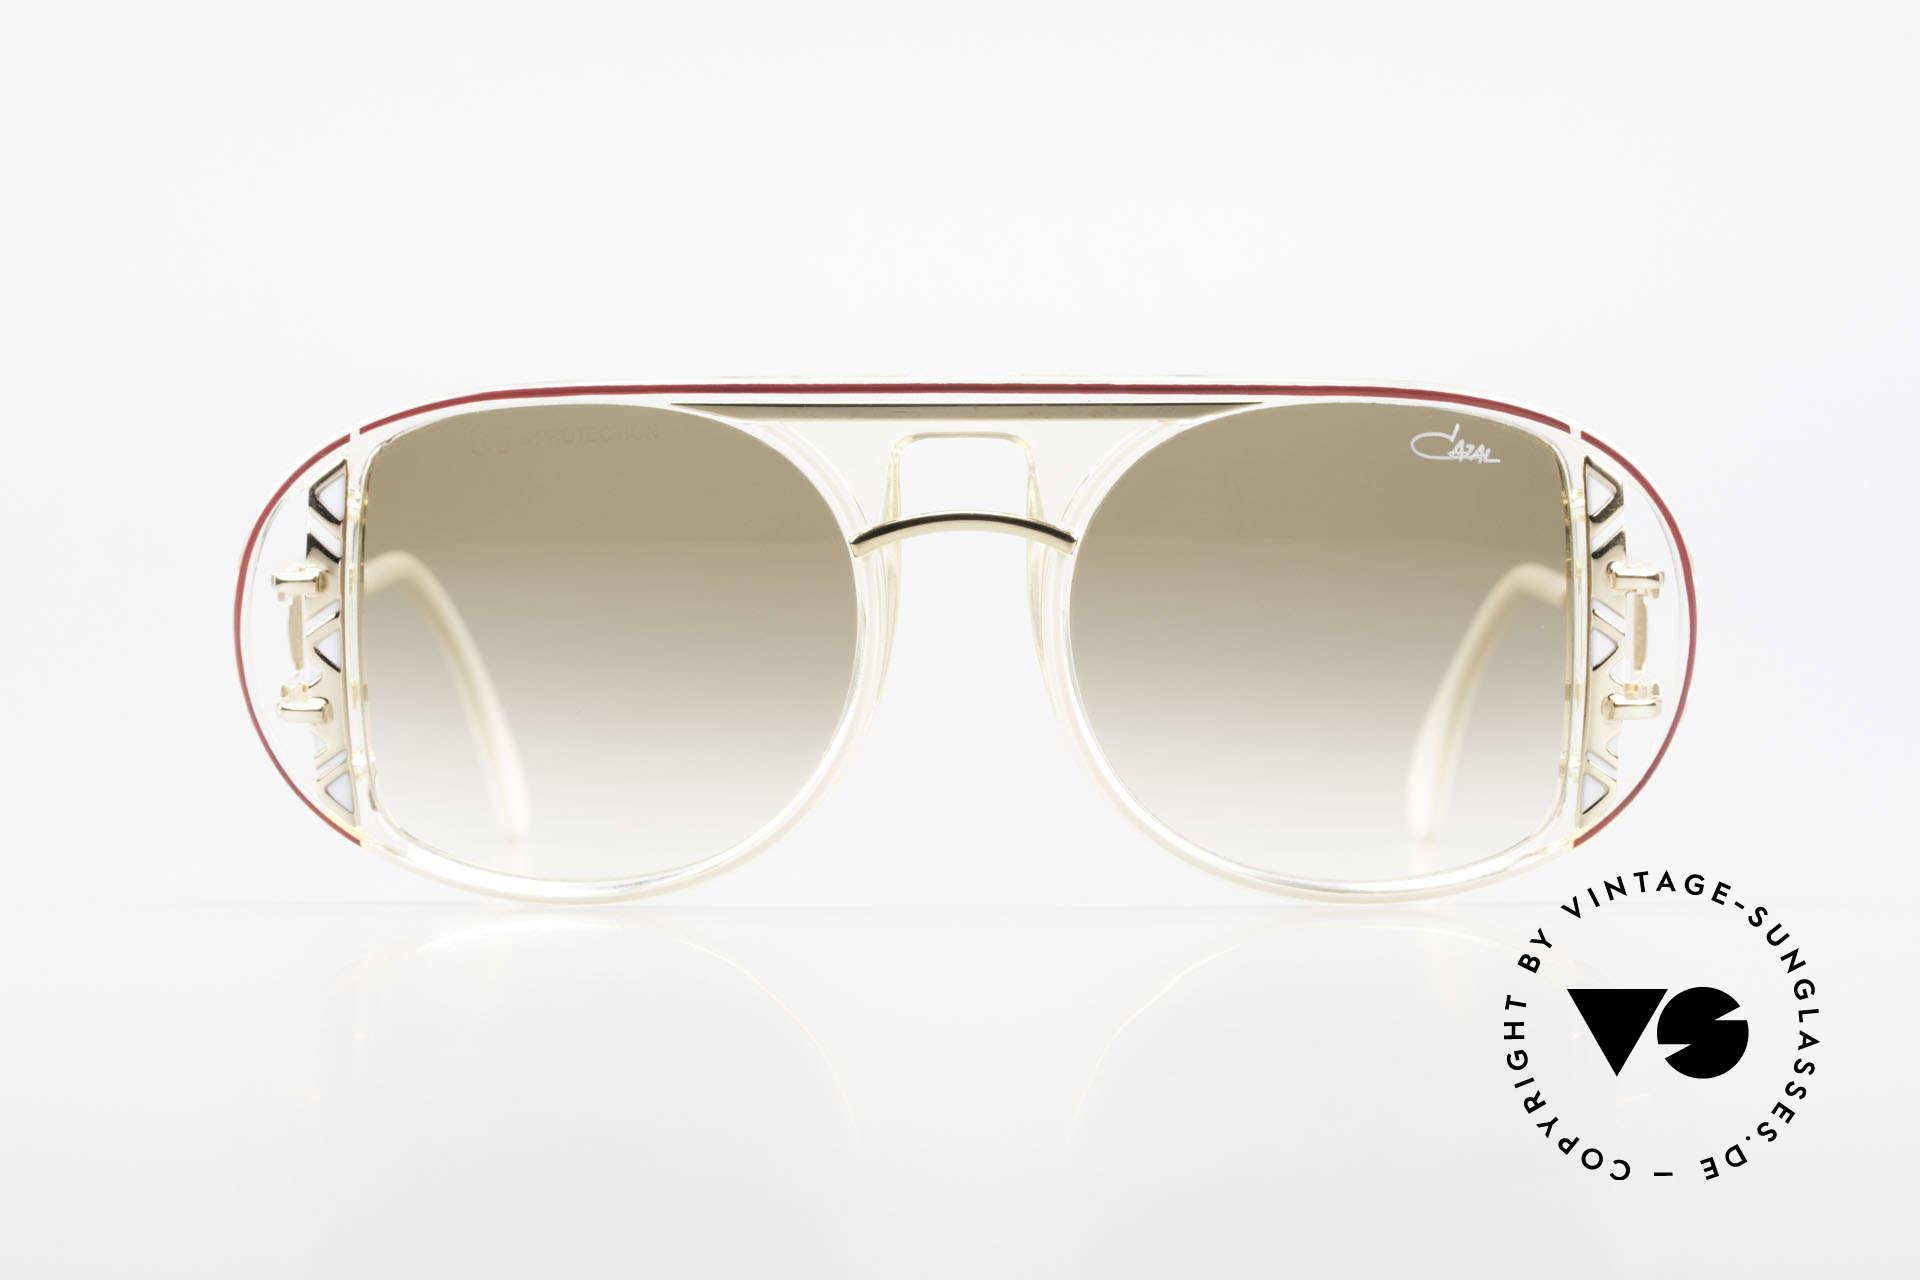 Cazal 875 Extraordinary 90's Sunglasses, made by design-guru CAri ZALloni (Mr. CAZAL), Made for Men and Women